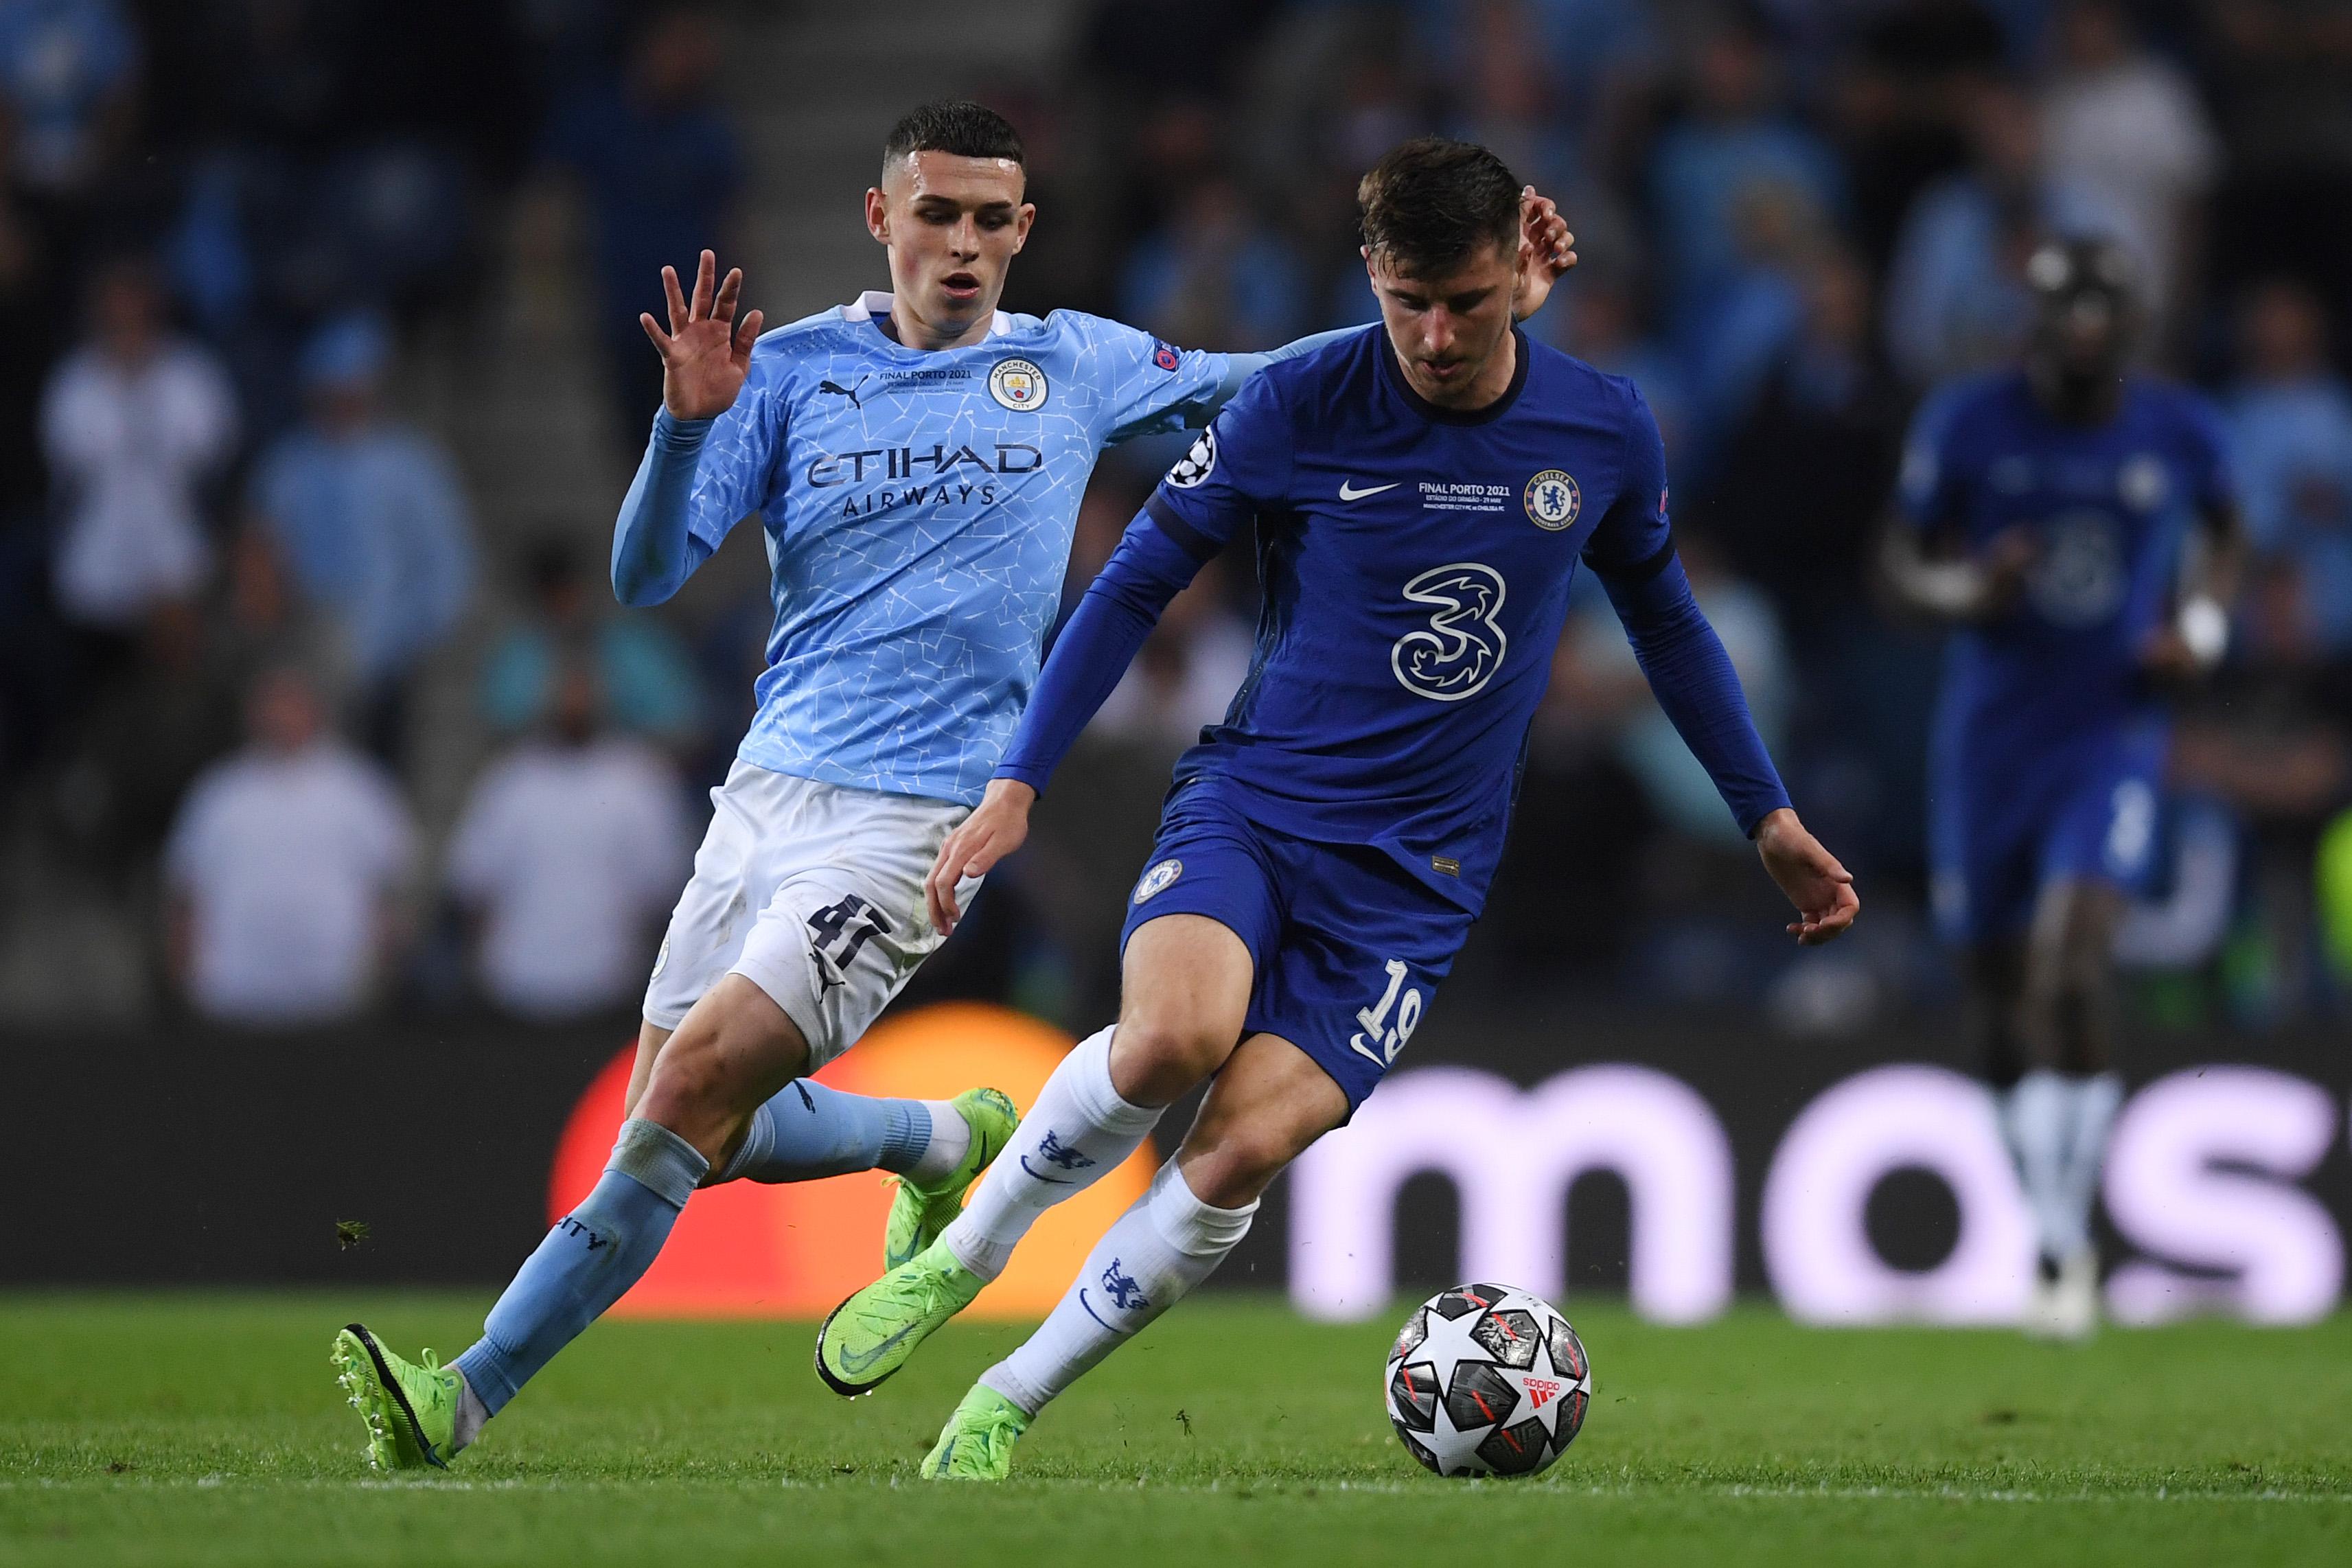 Manchester City v Chelsea FC - UEFA Champions League Final